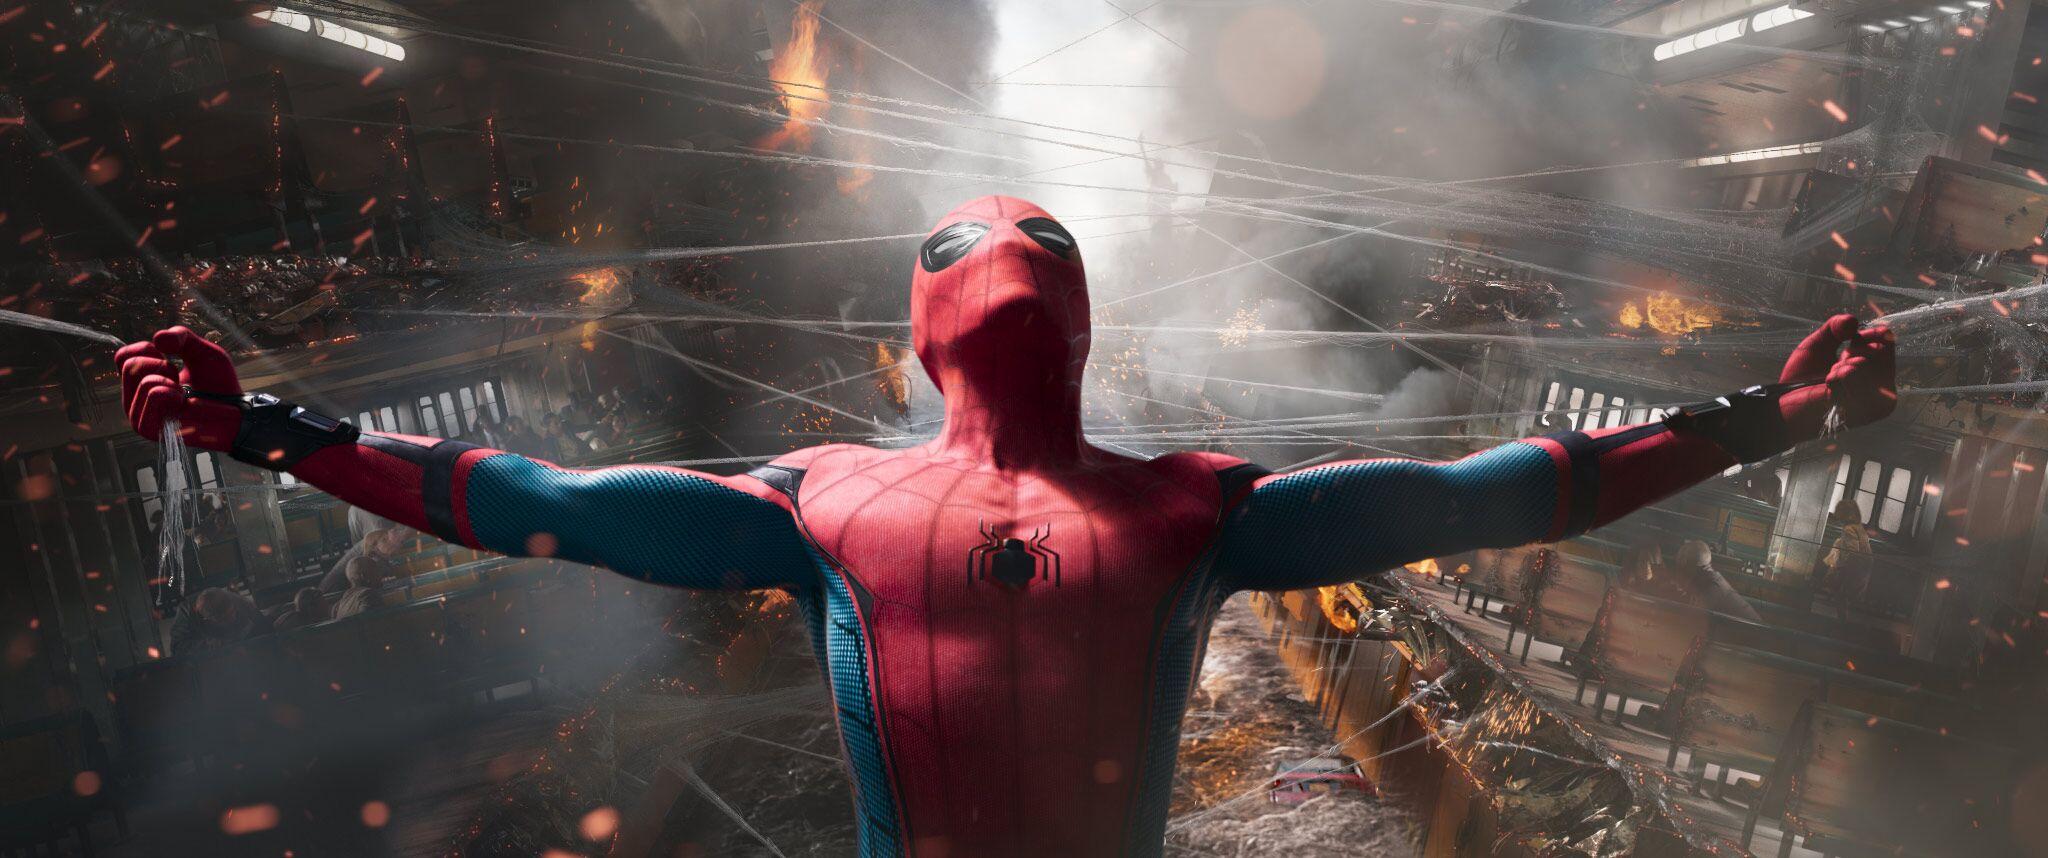 Spider-Man: Homecoming 1.3 - (C) Marvel